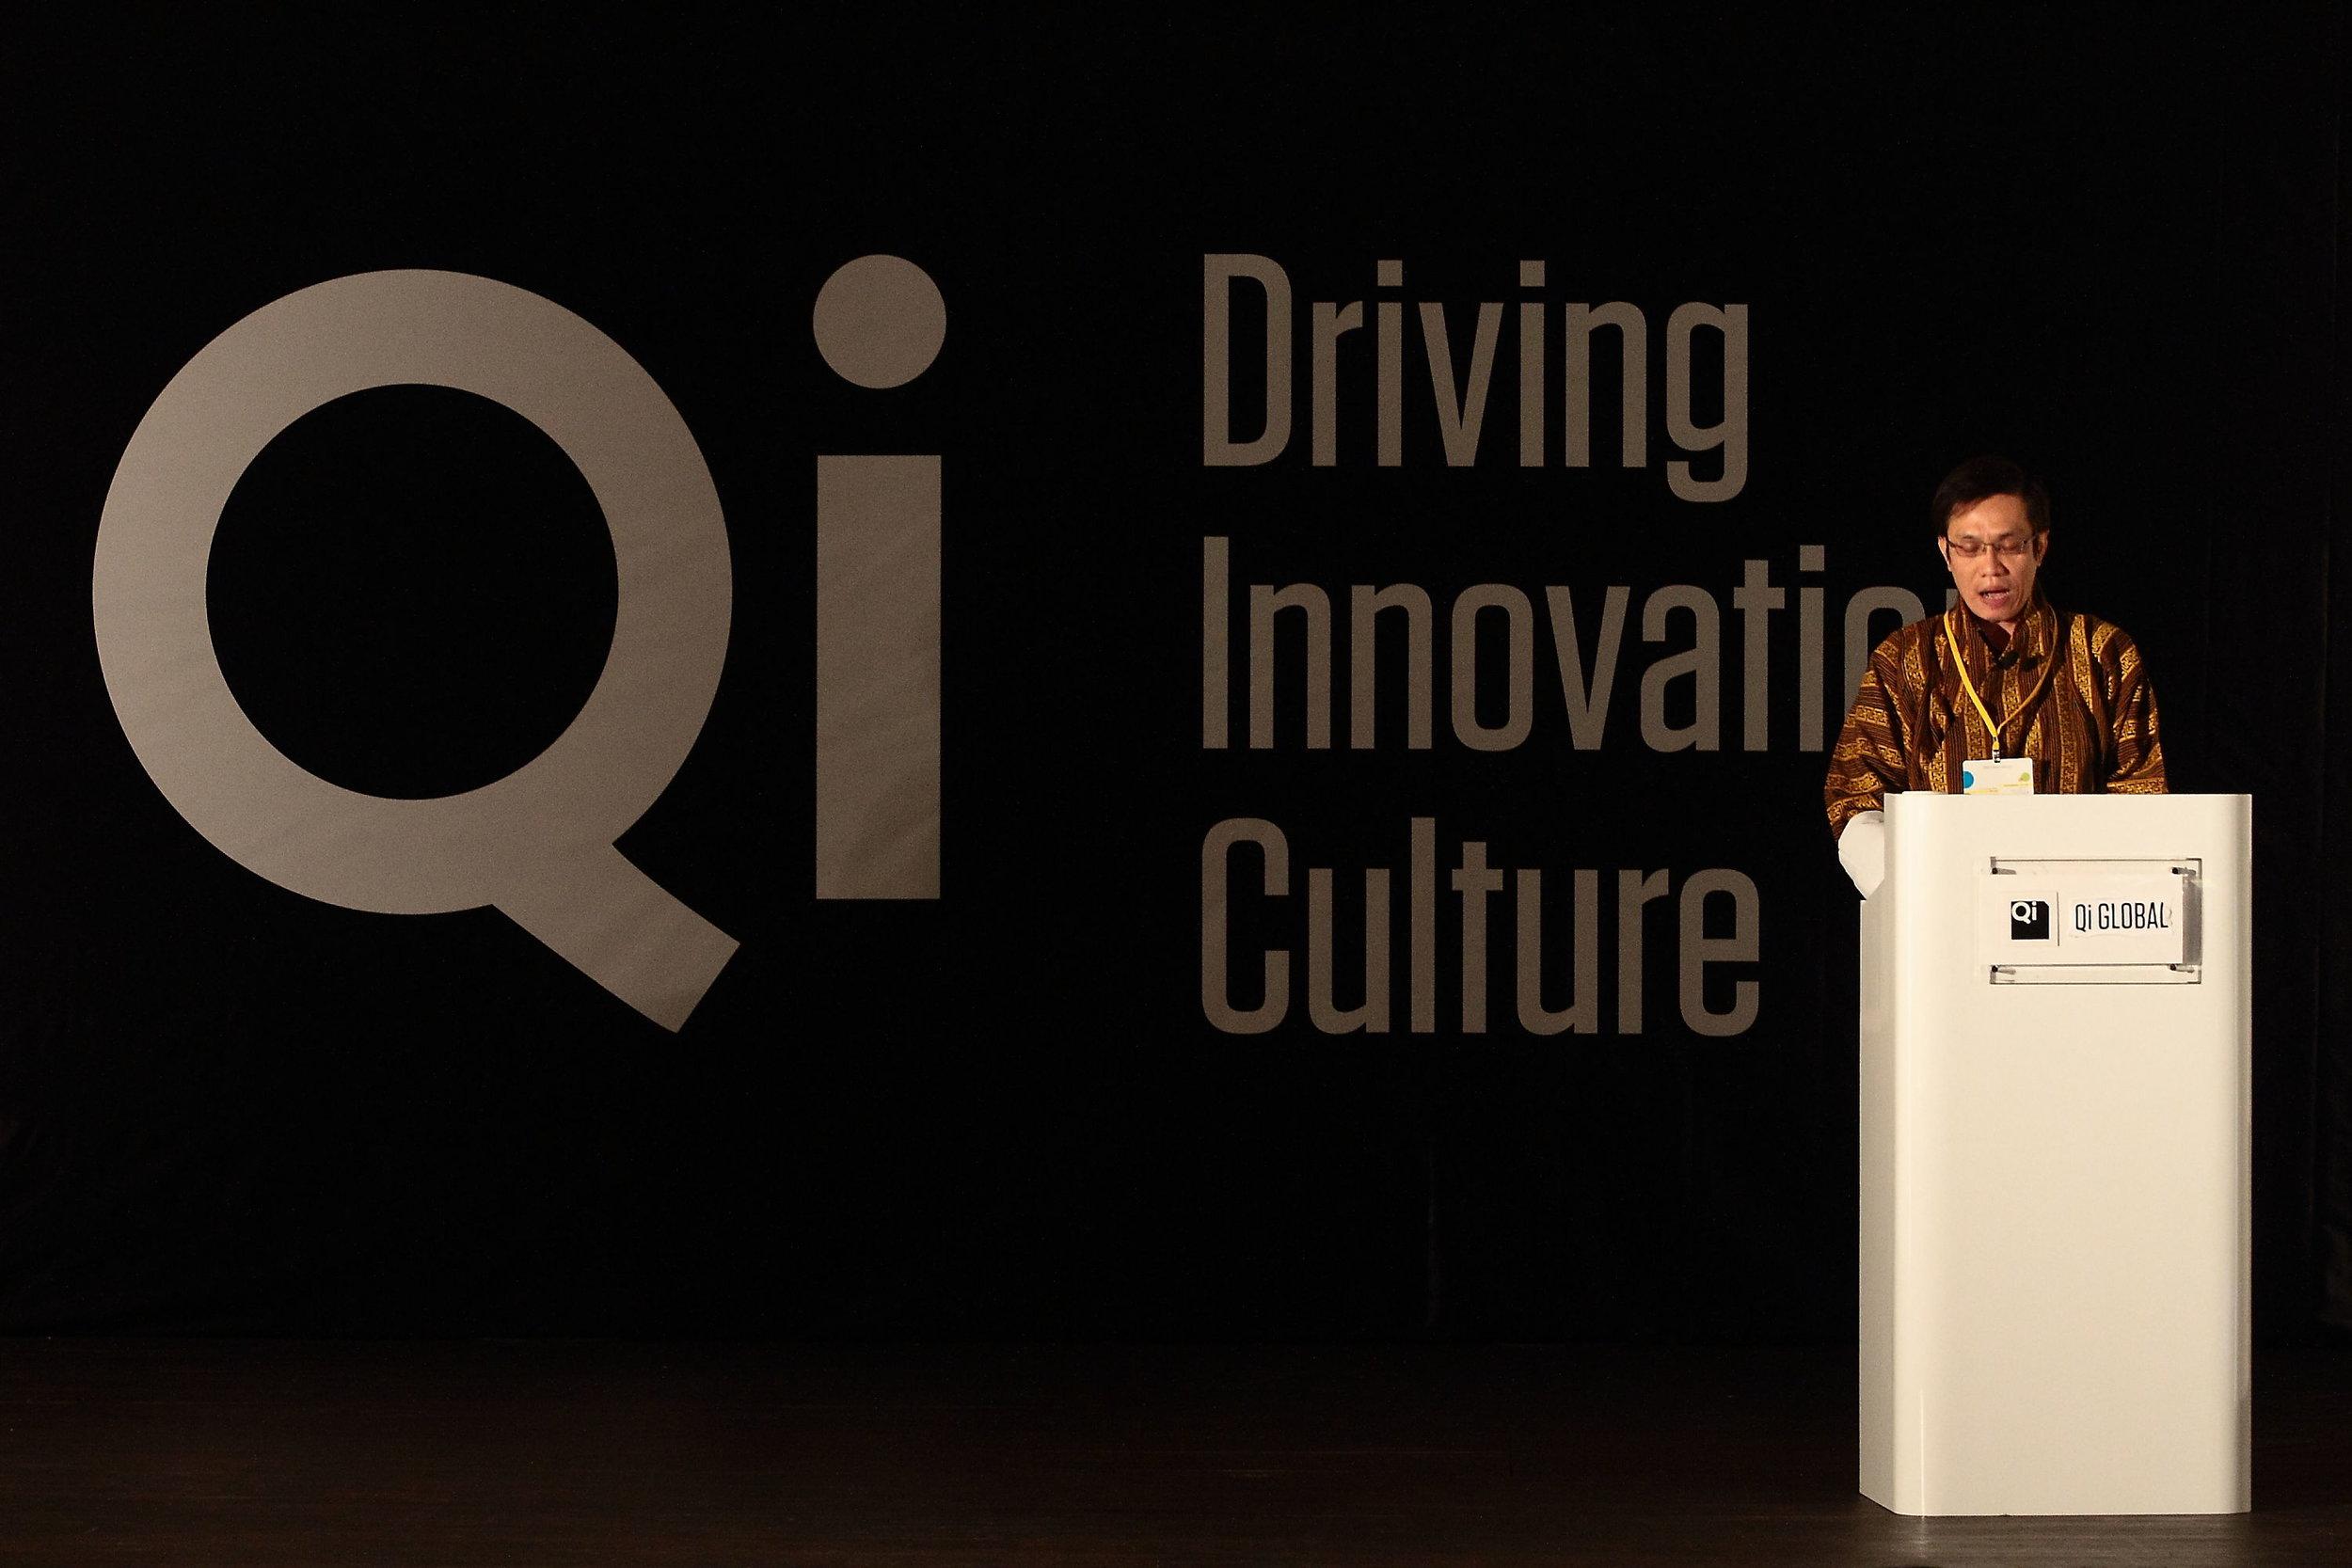 qi-global-2011-driving-innovation-culture-078.jpg